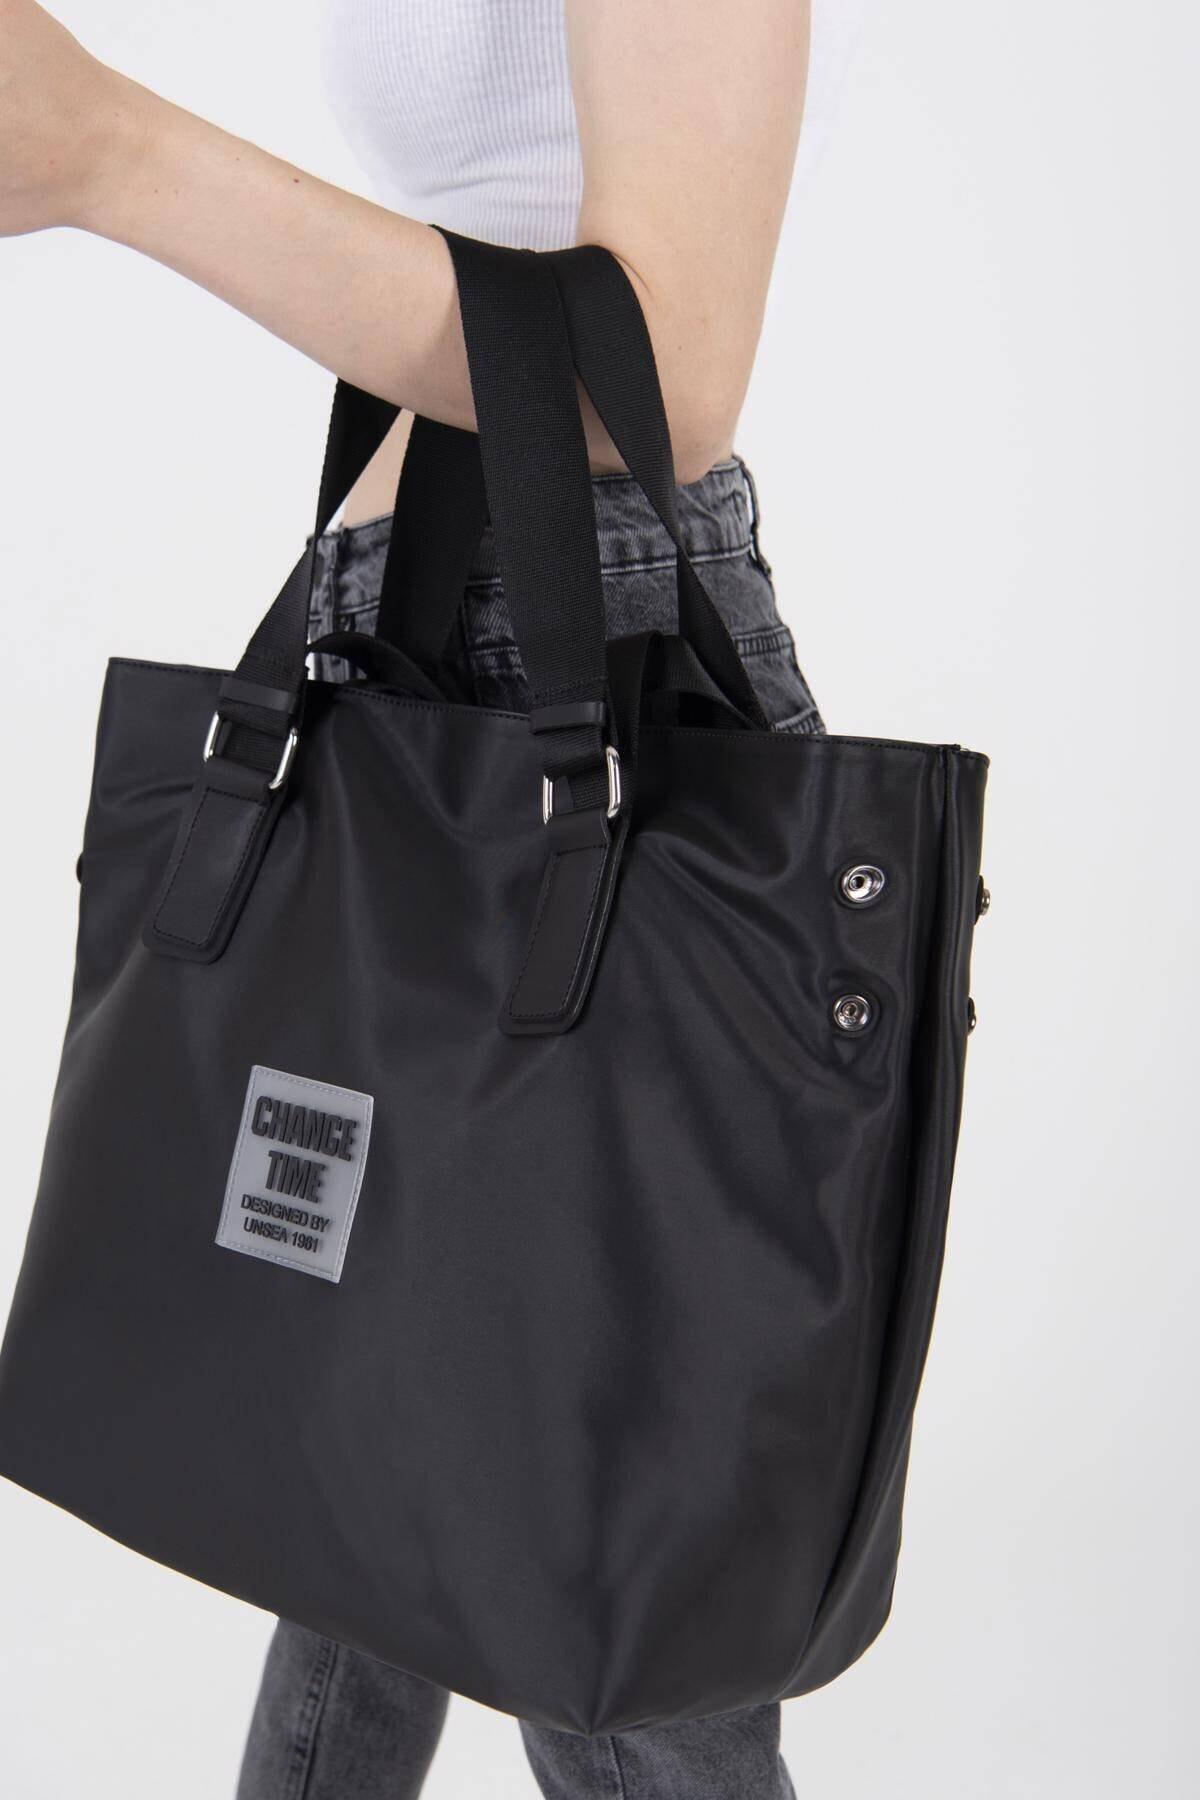 Addax Kadın Siyah Çıtçıt Detaylı Büyük Çanta Ç3215 - F9 ADX-0000022923 2